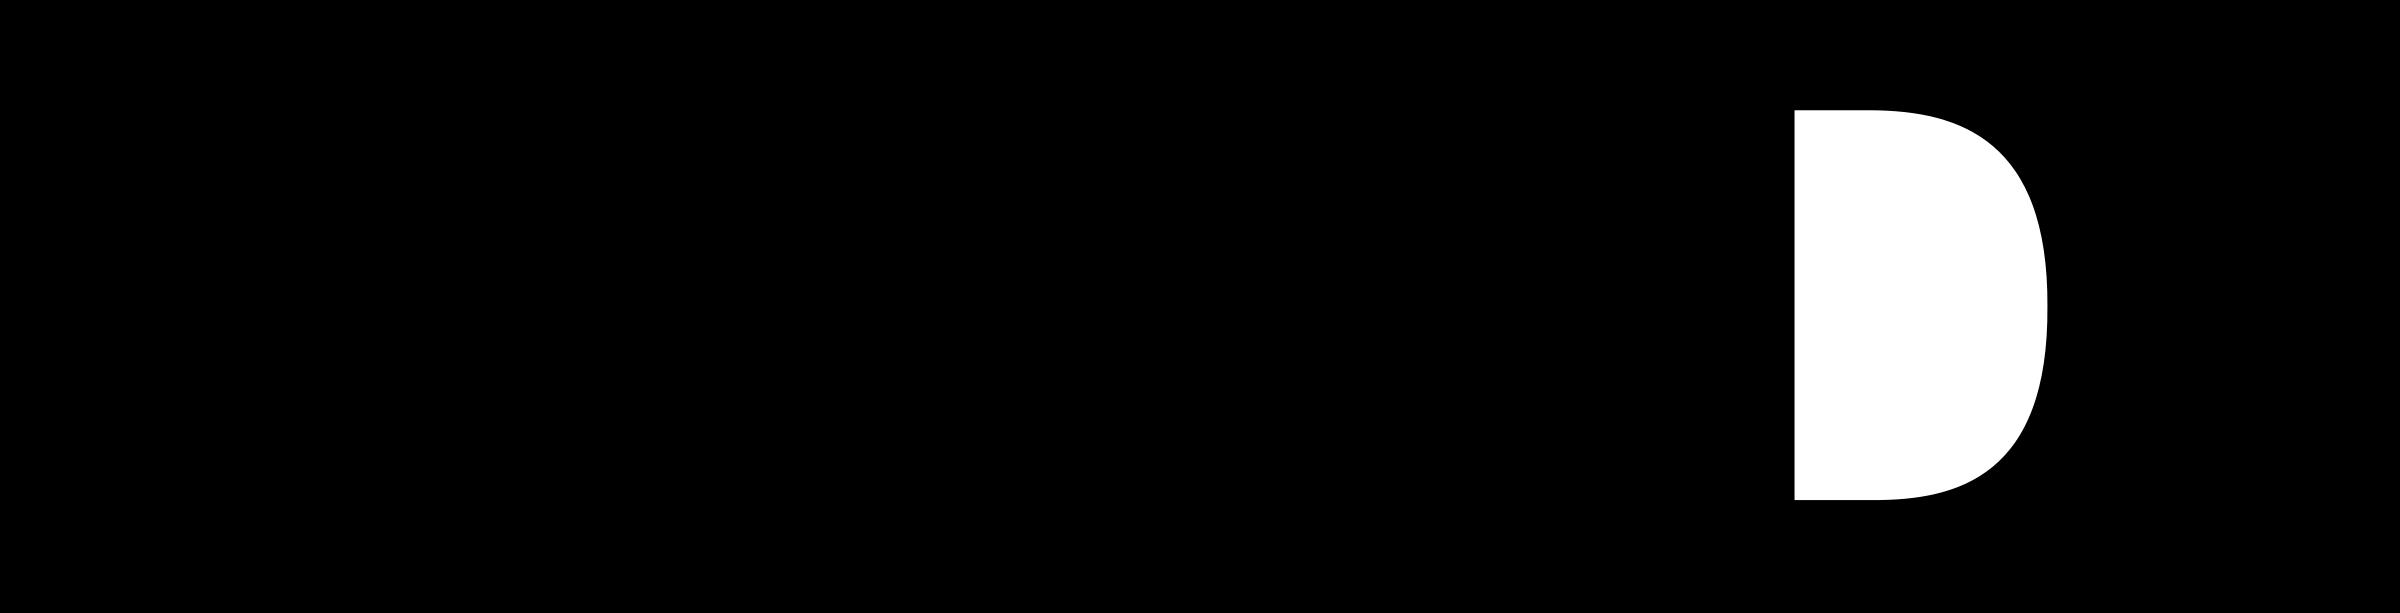 Fendi logo clipart svg Fendi Logo Png – animesubindo.co svg